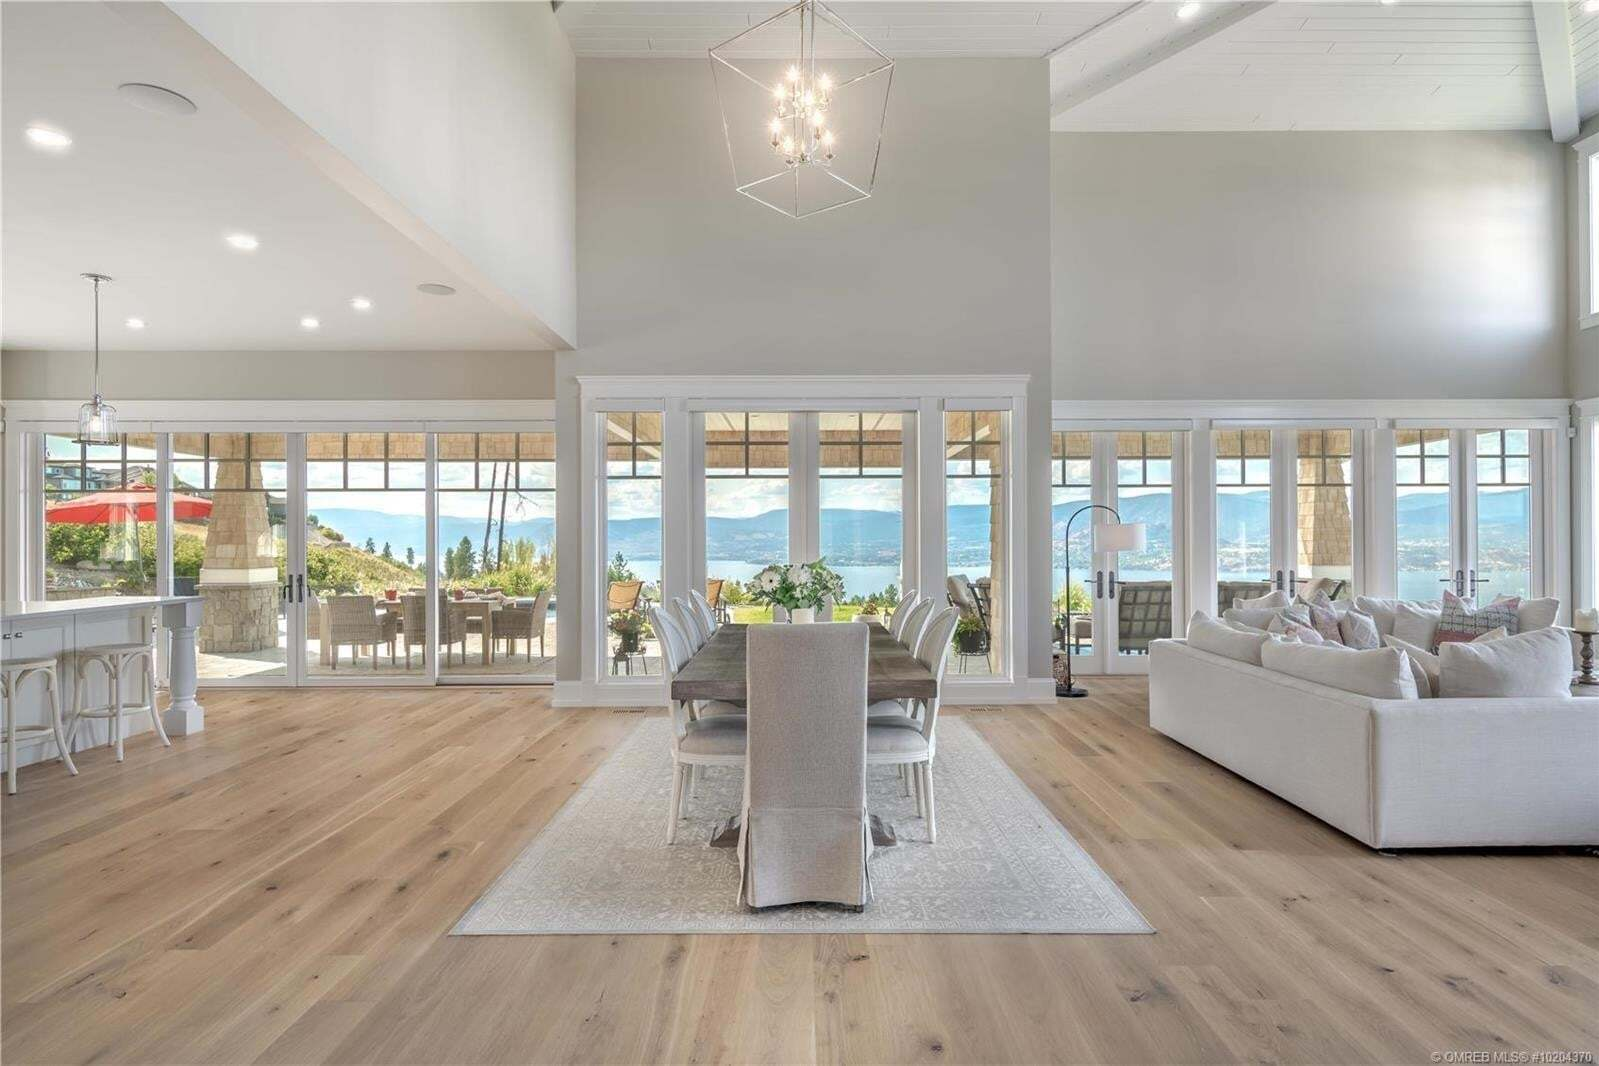 House for sale at 940 Lakecrest Ct Kelowna British Columbia - MLS: 10204370